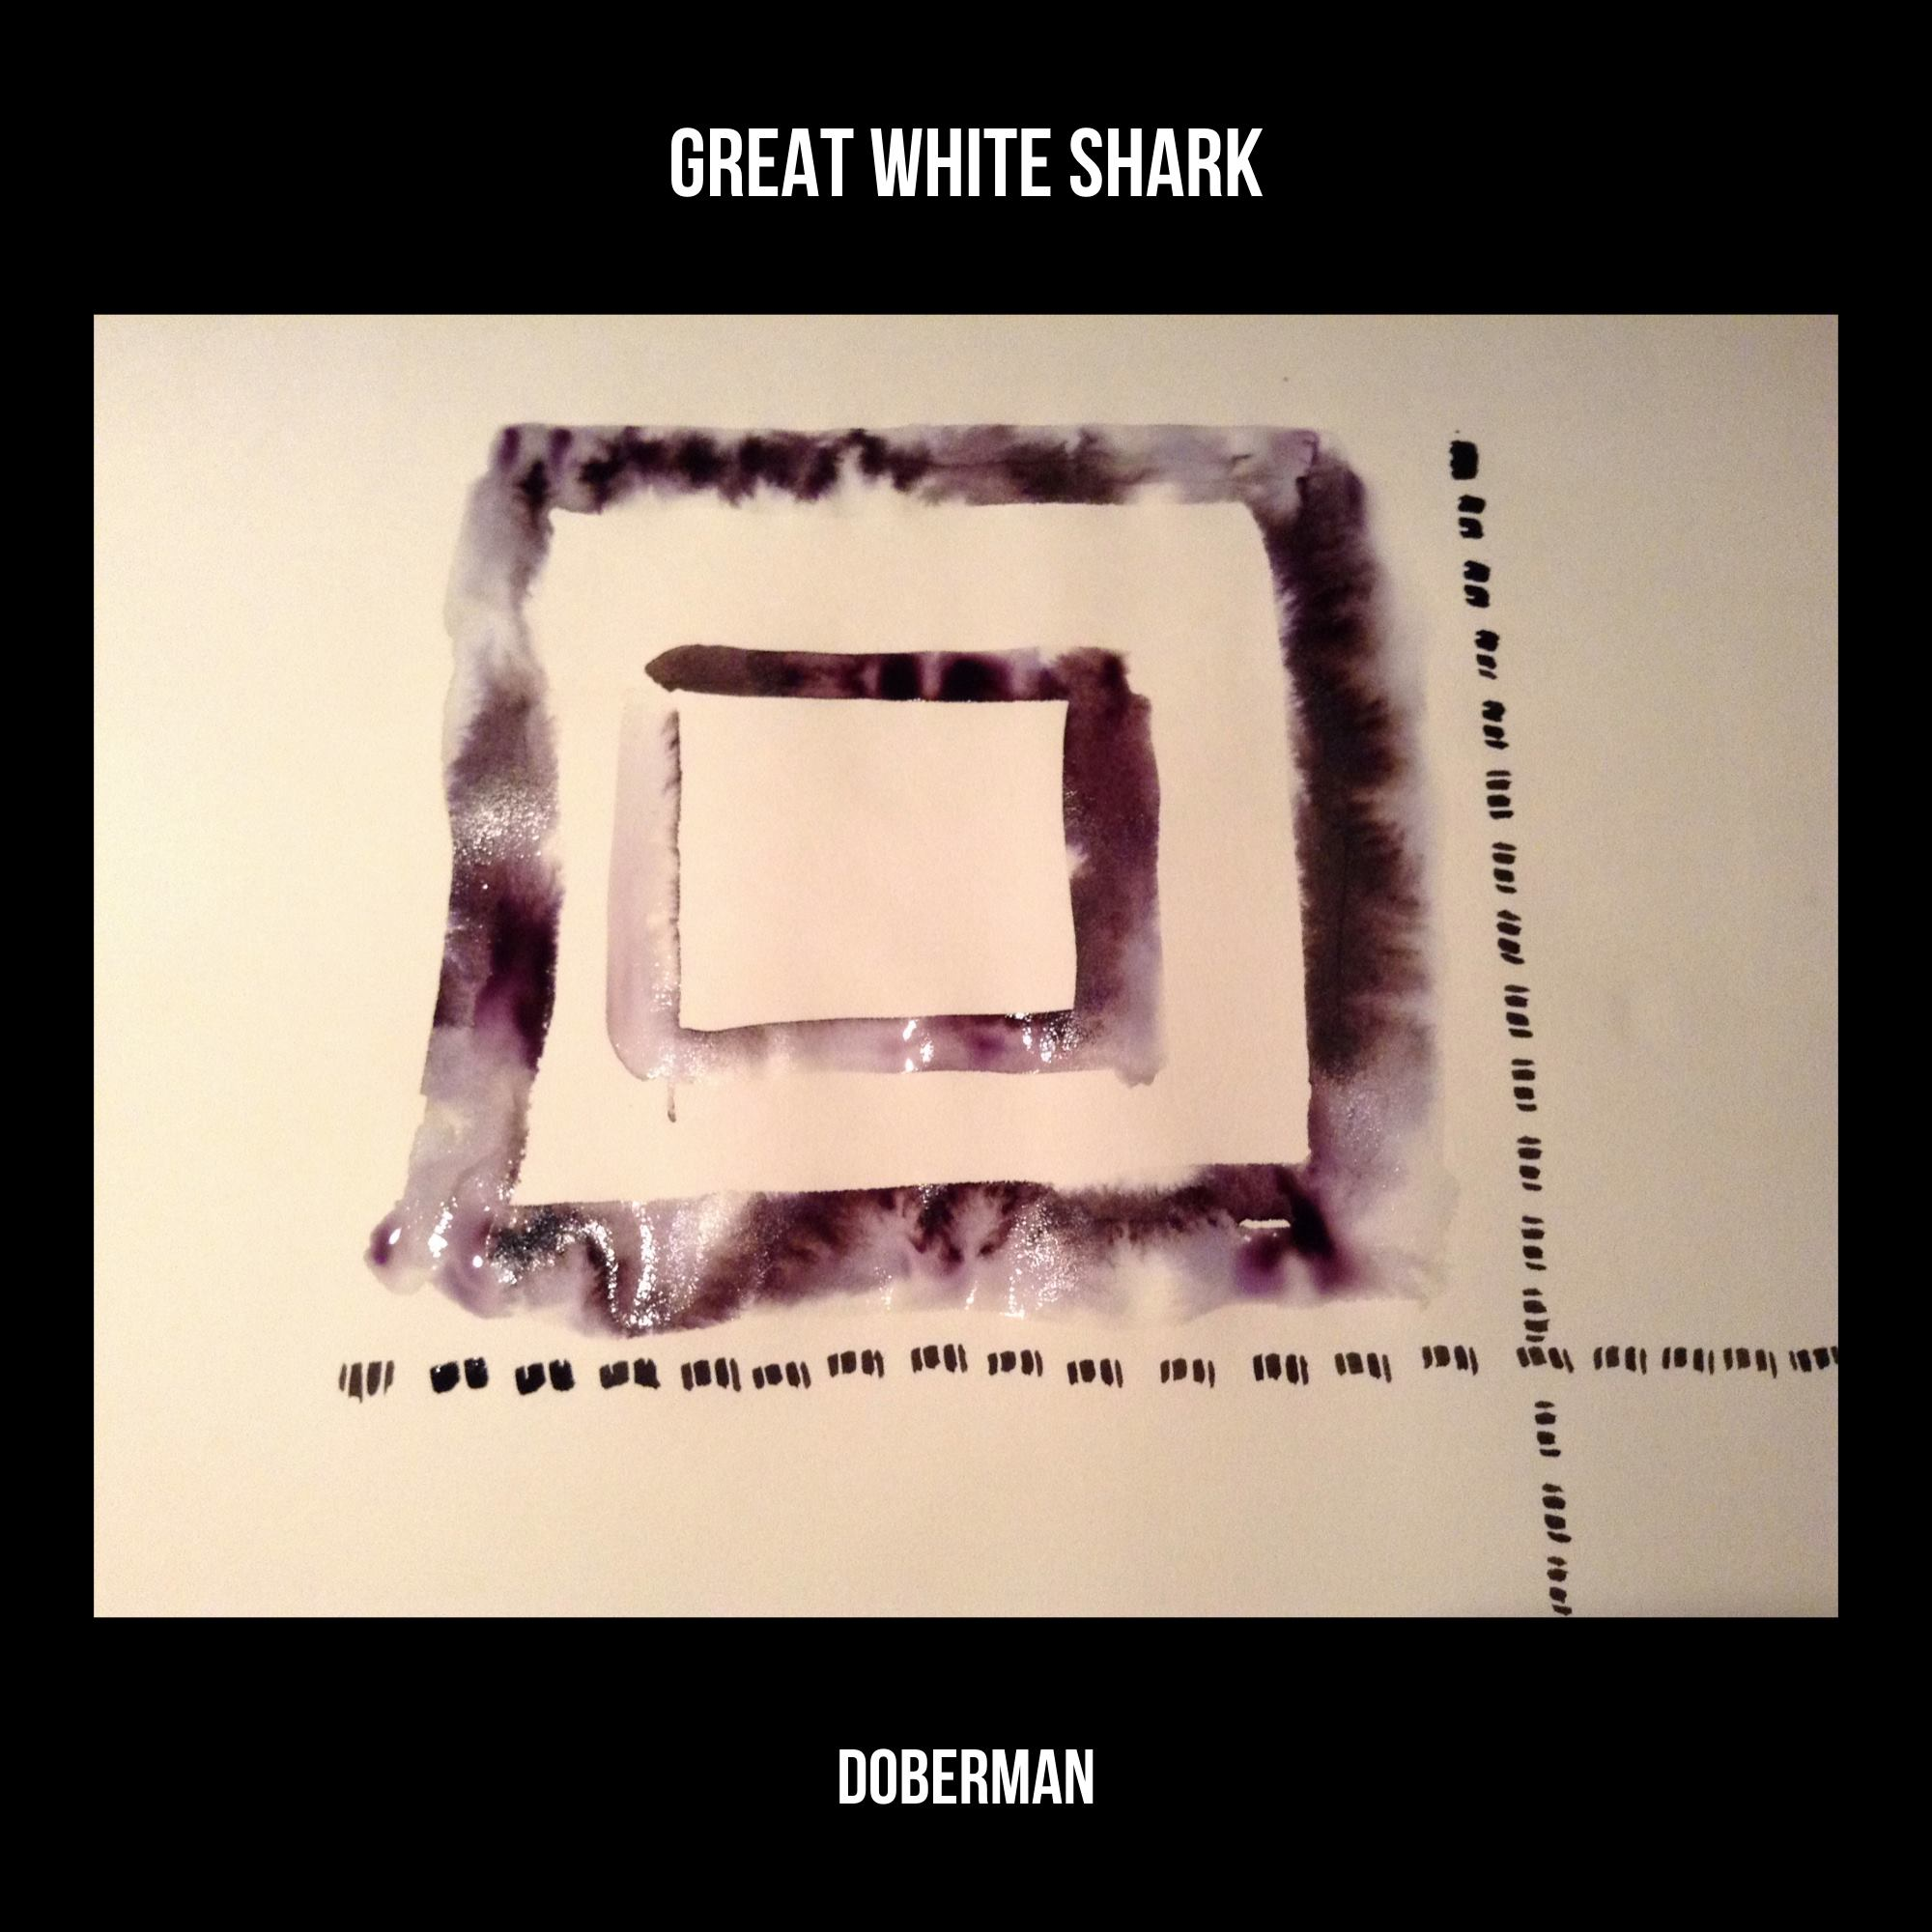 GREAT WHITE SHARK Doberman - Music Production & Mixing